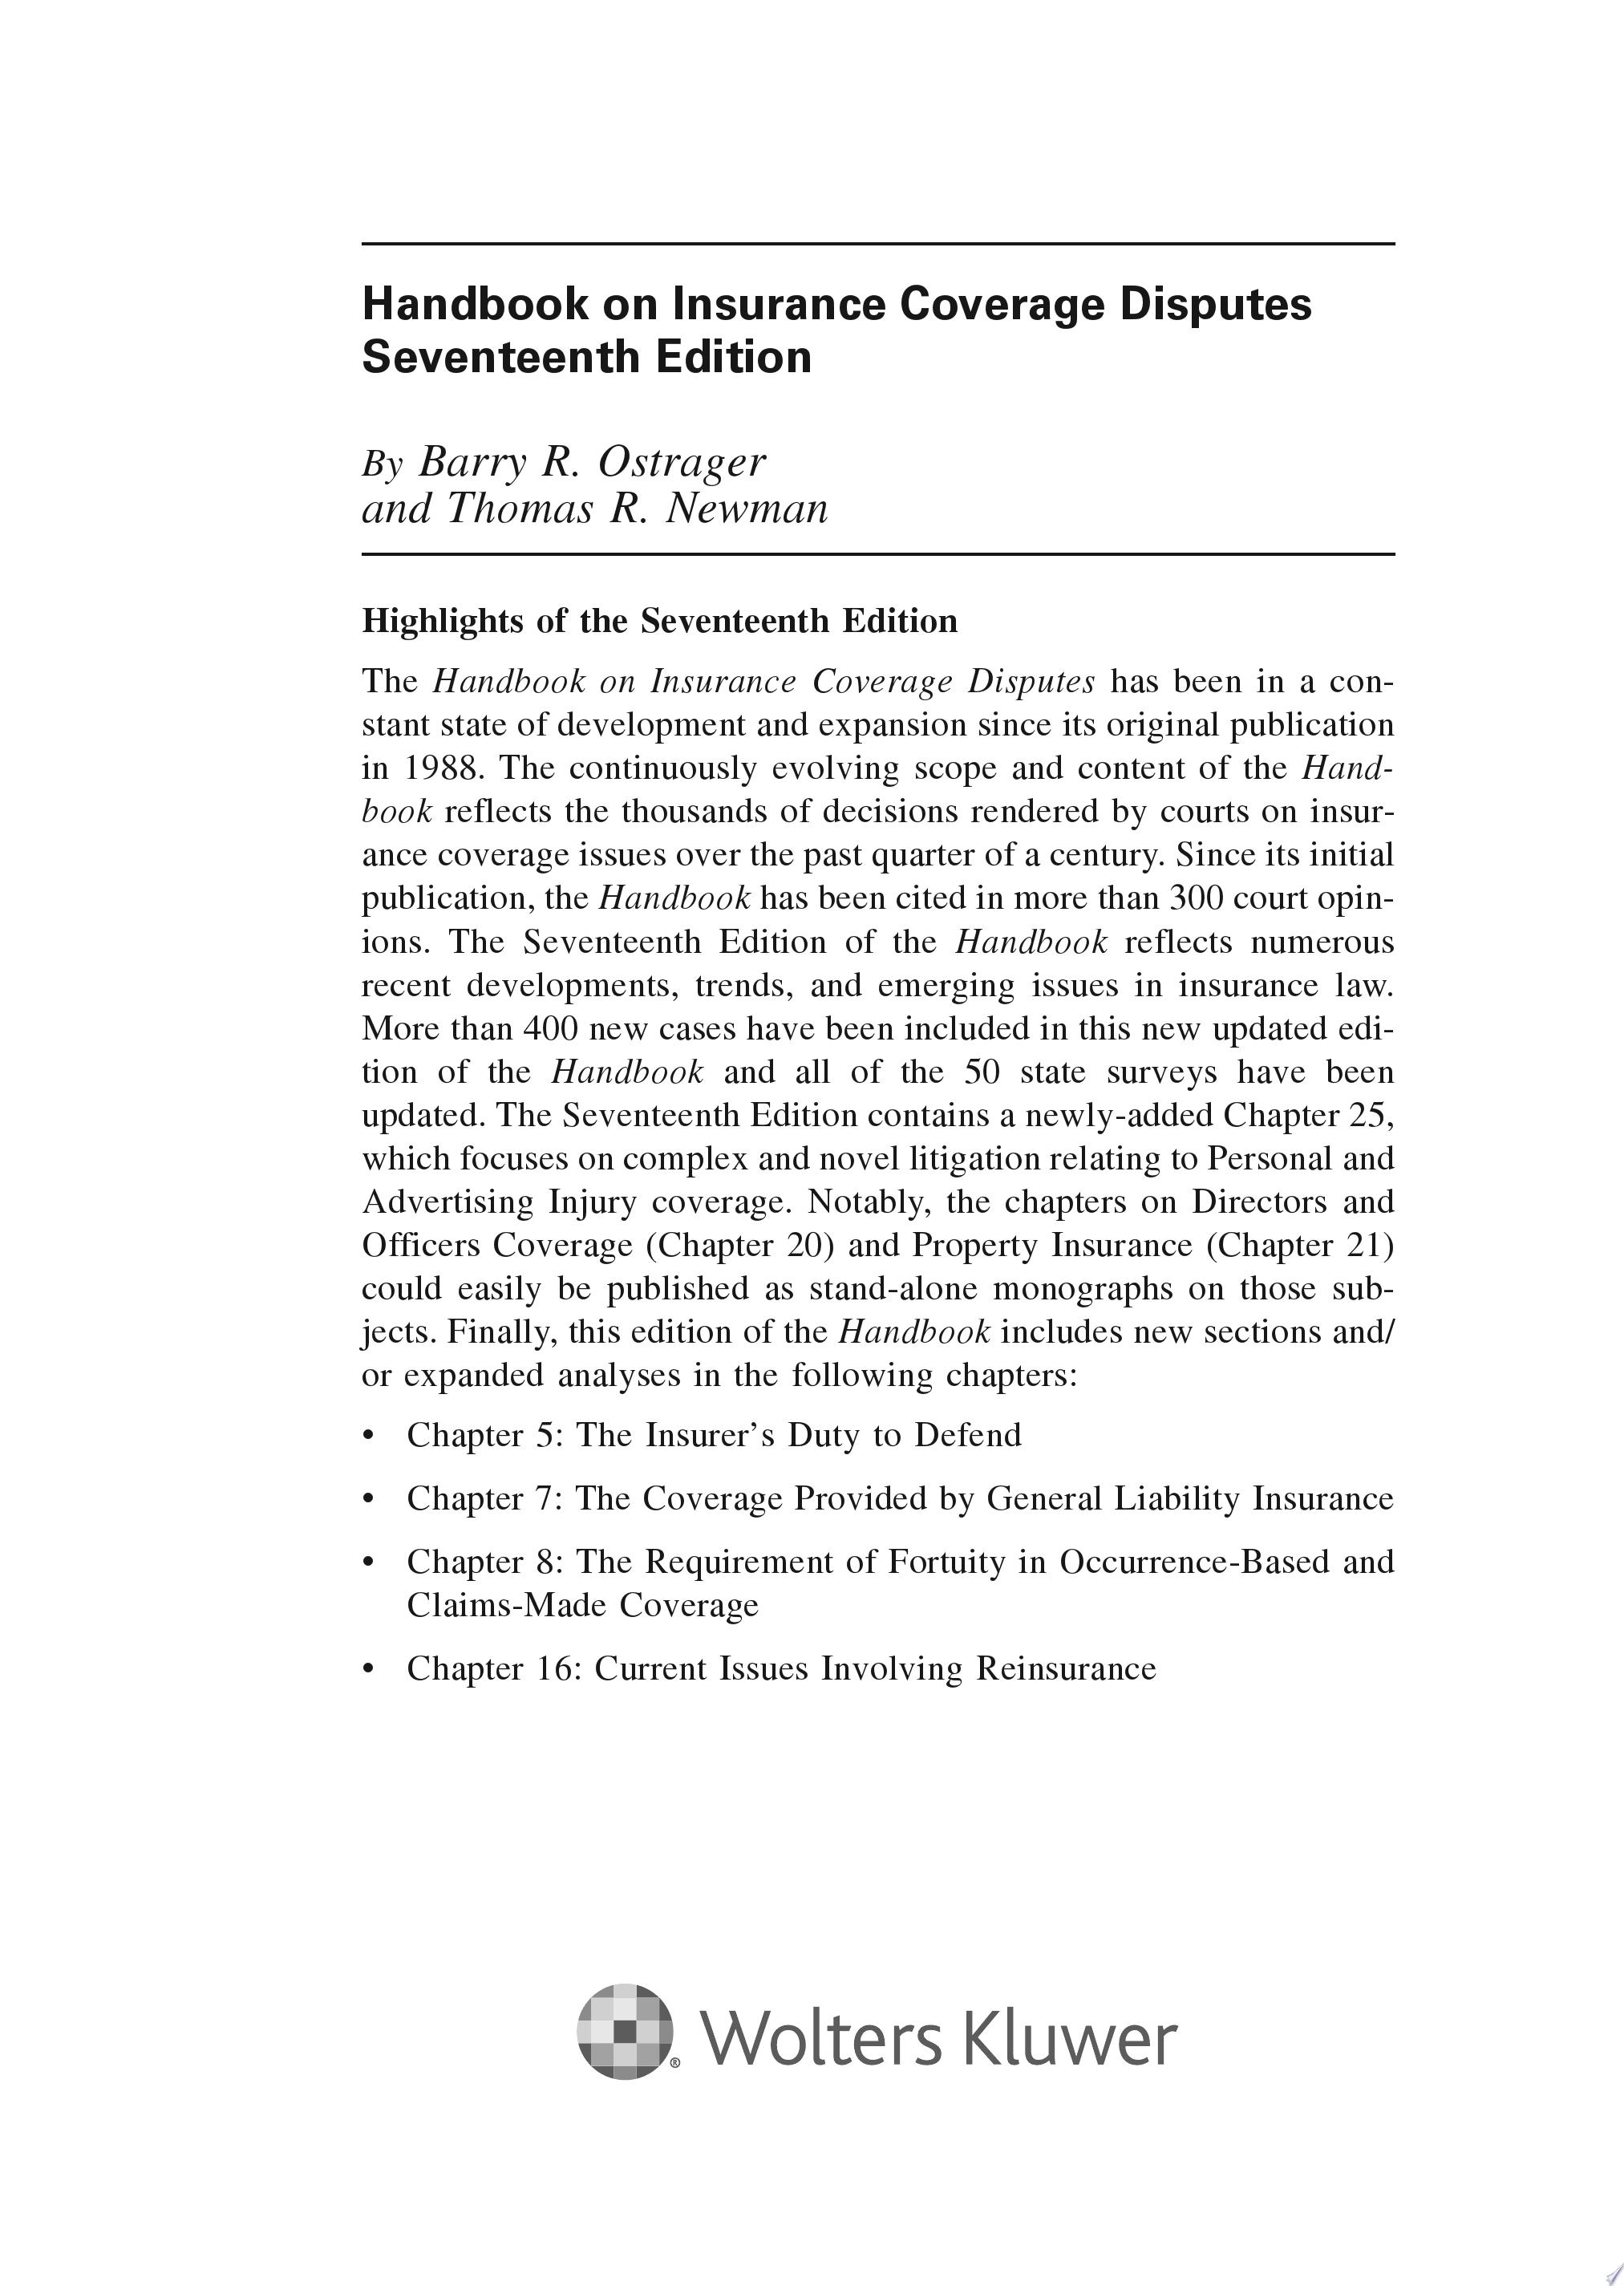 Handbook on Insurance Coverage Disputes 17e  3 Volumes